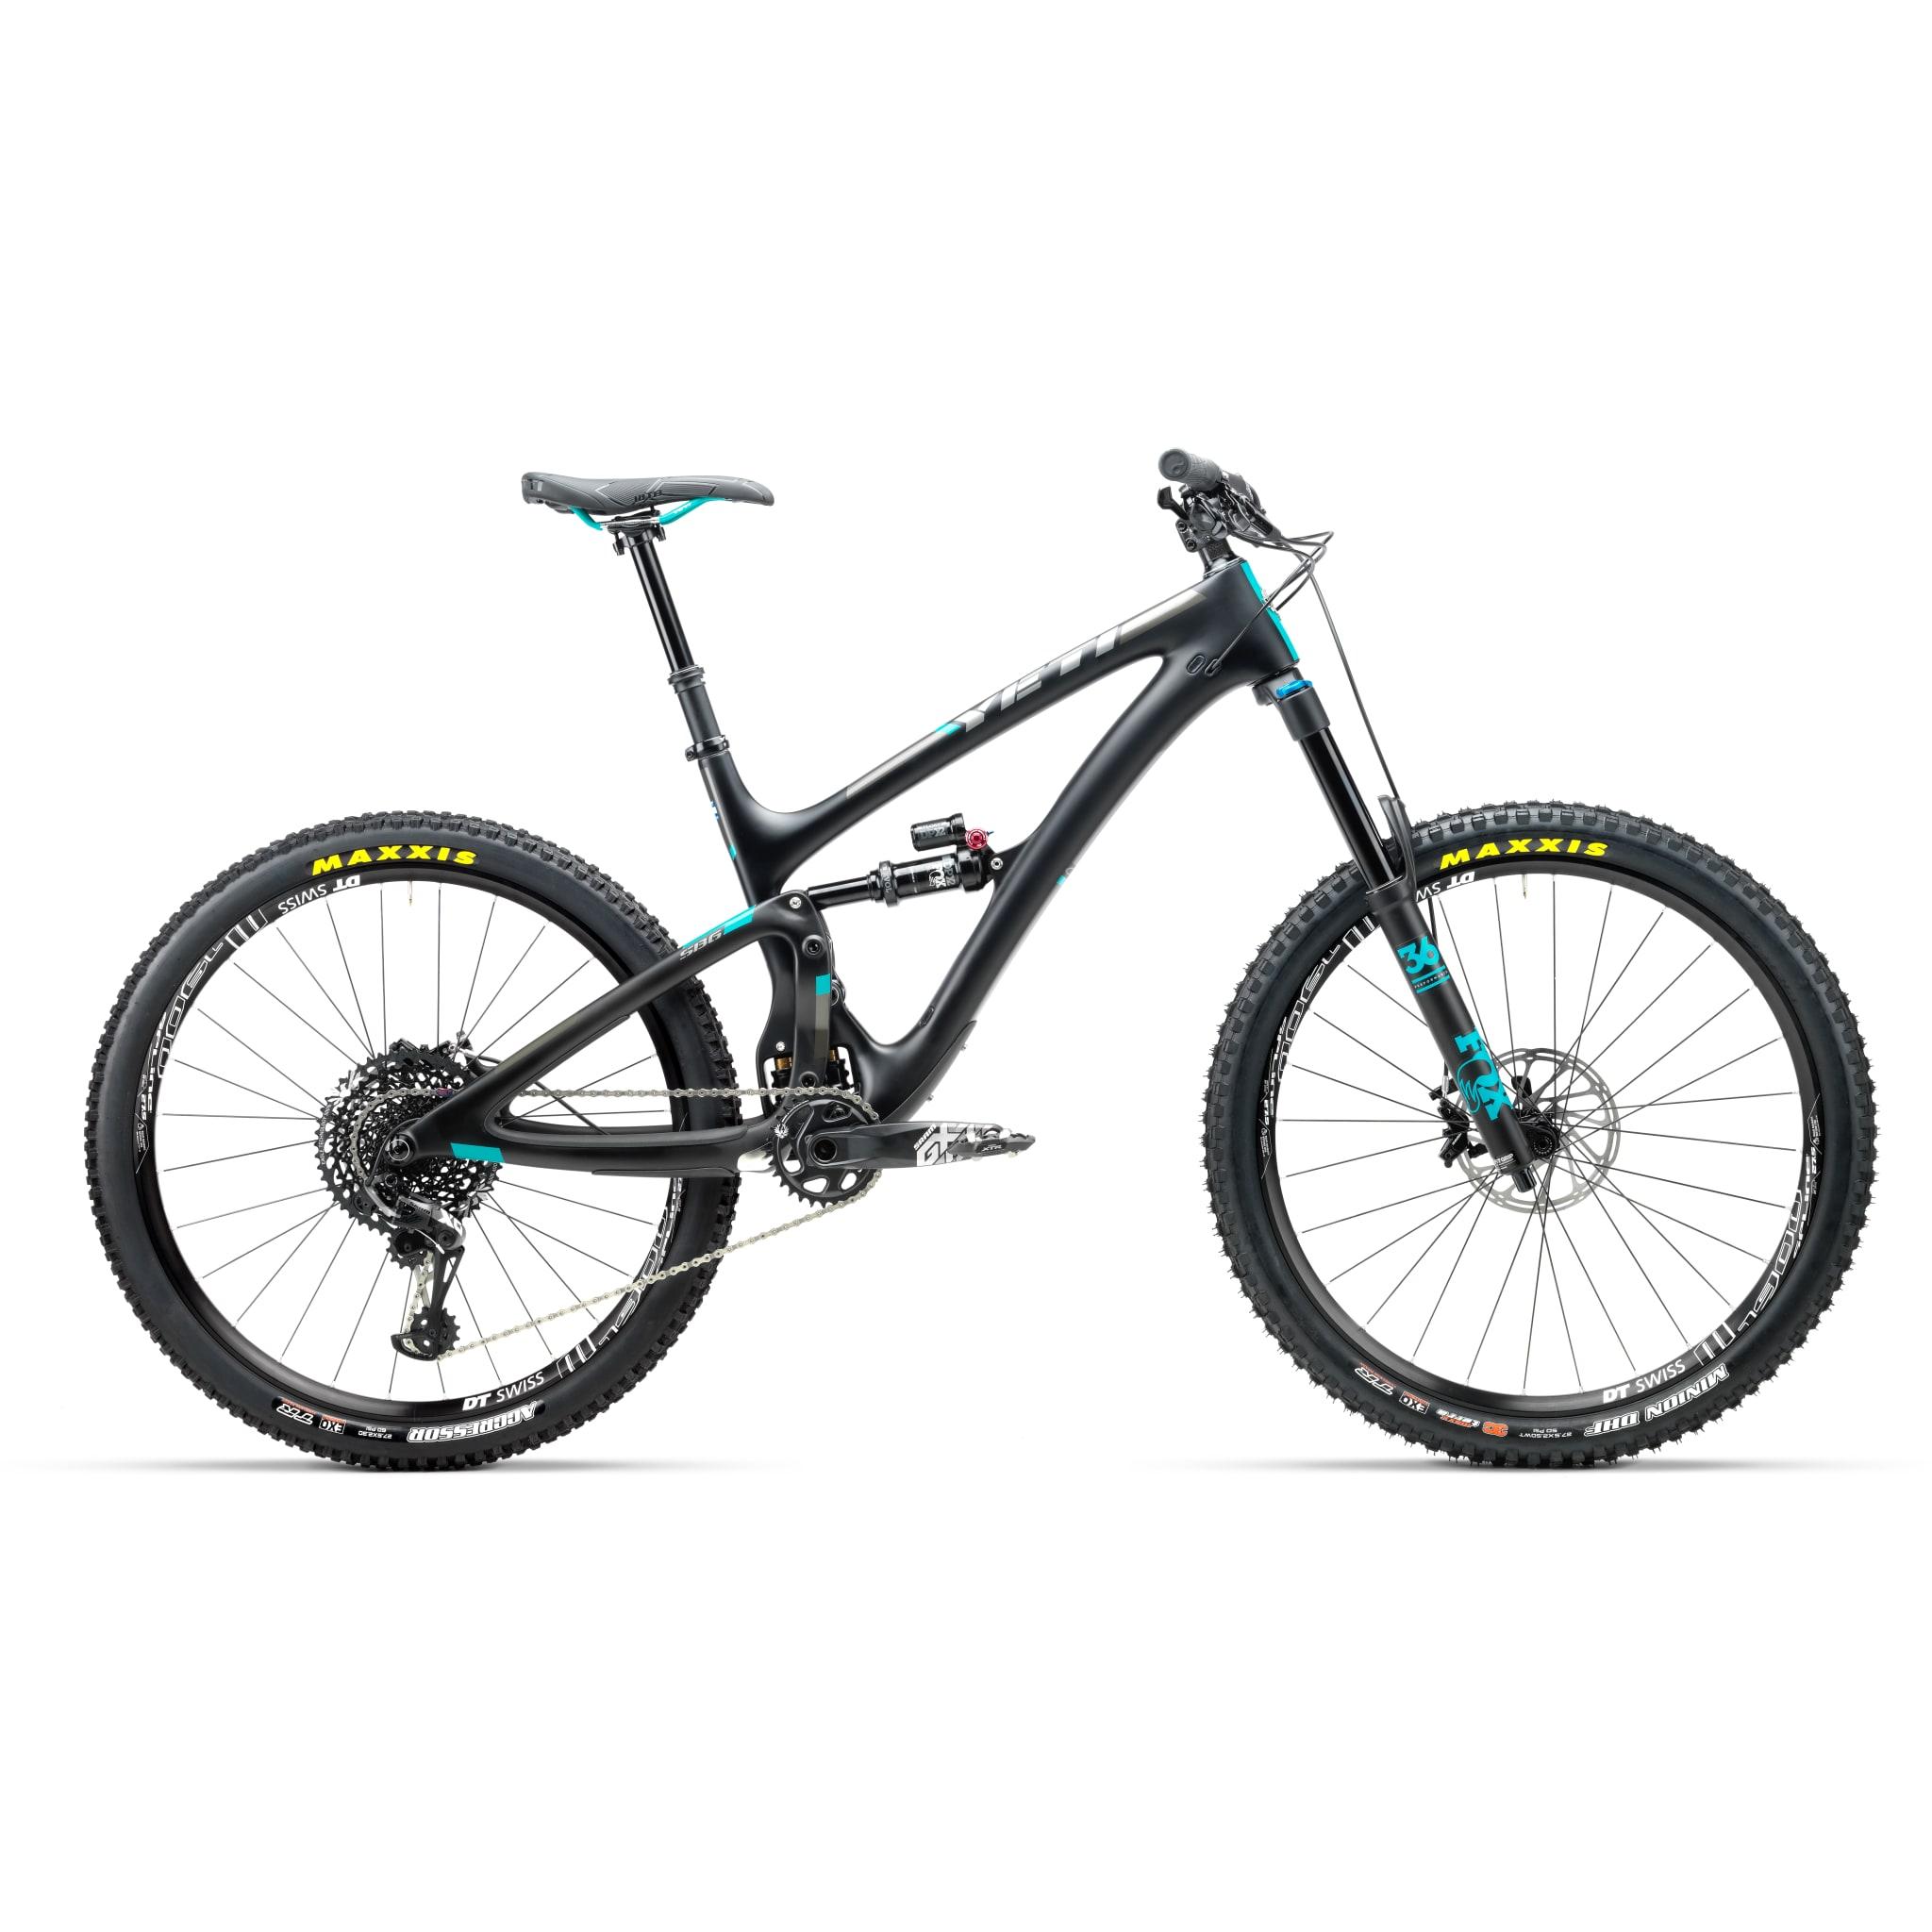 2018 SB6 Carbon GX Eagle